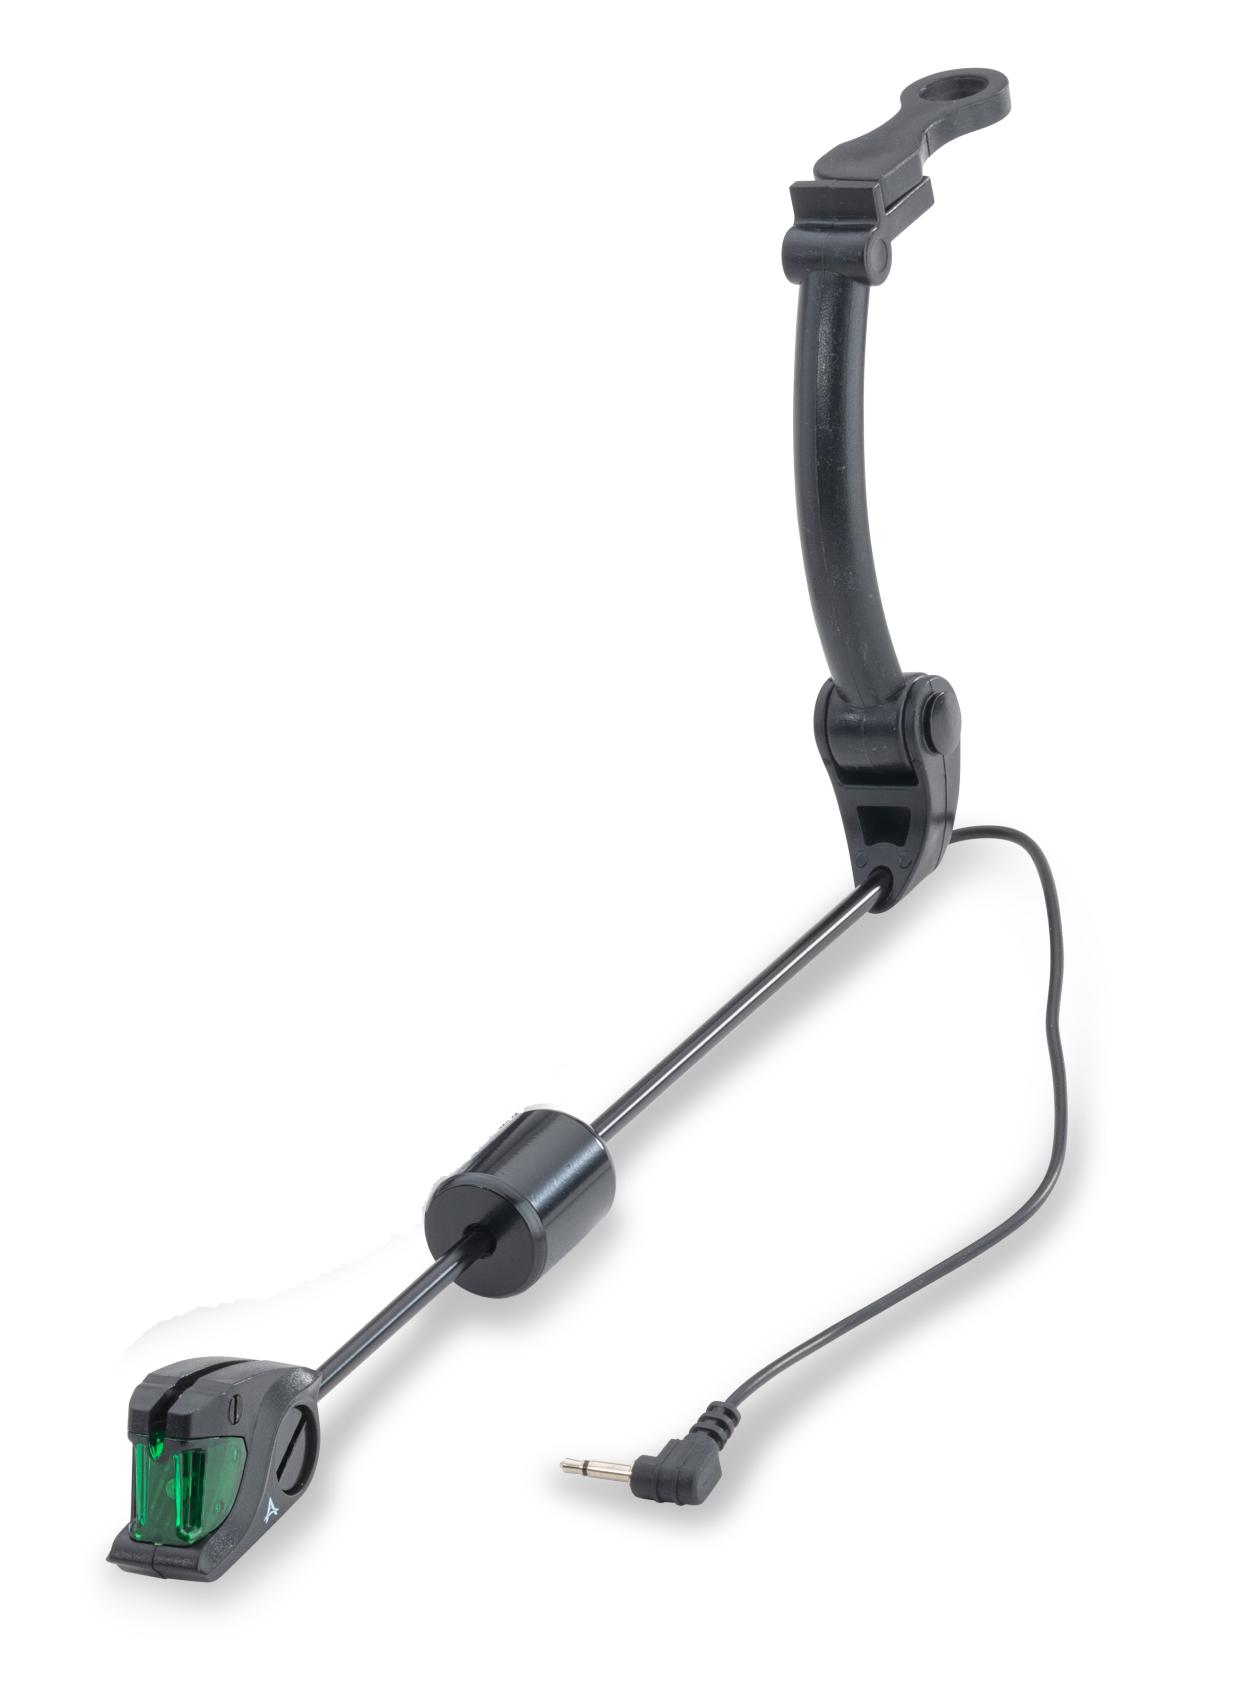 Anaconda Indikátor záběru Vipex RSX, zelená